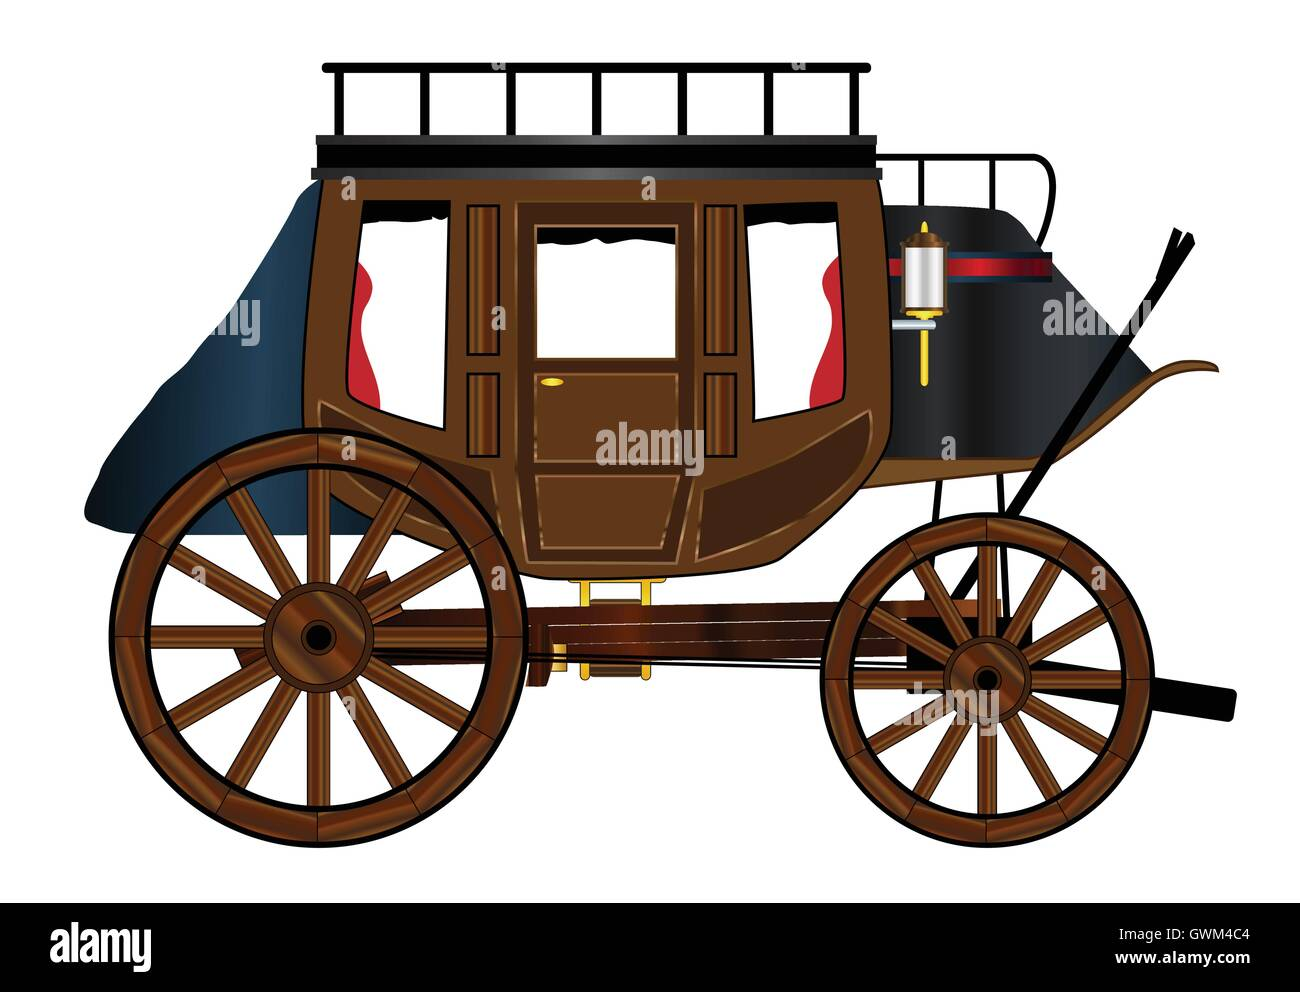 Western Stagecoach Stock Photos & Western Stagecoach Stock ...